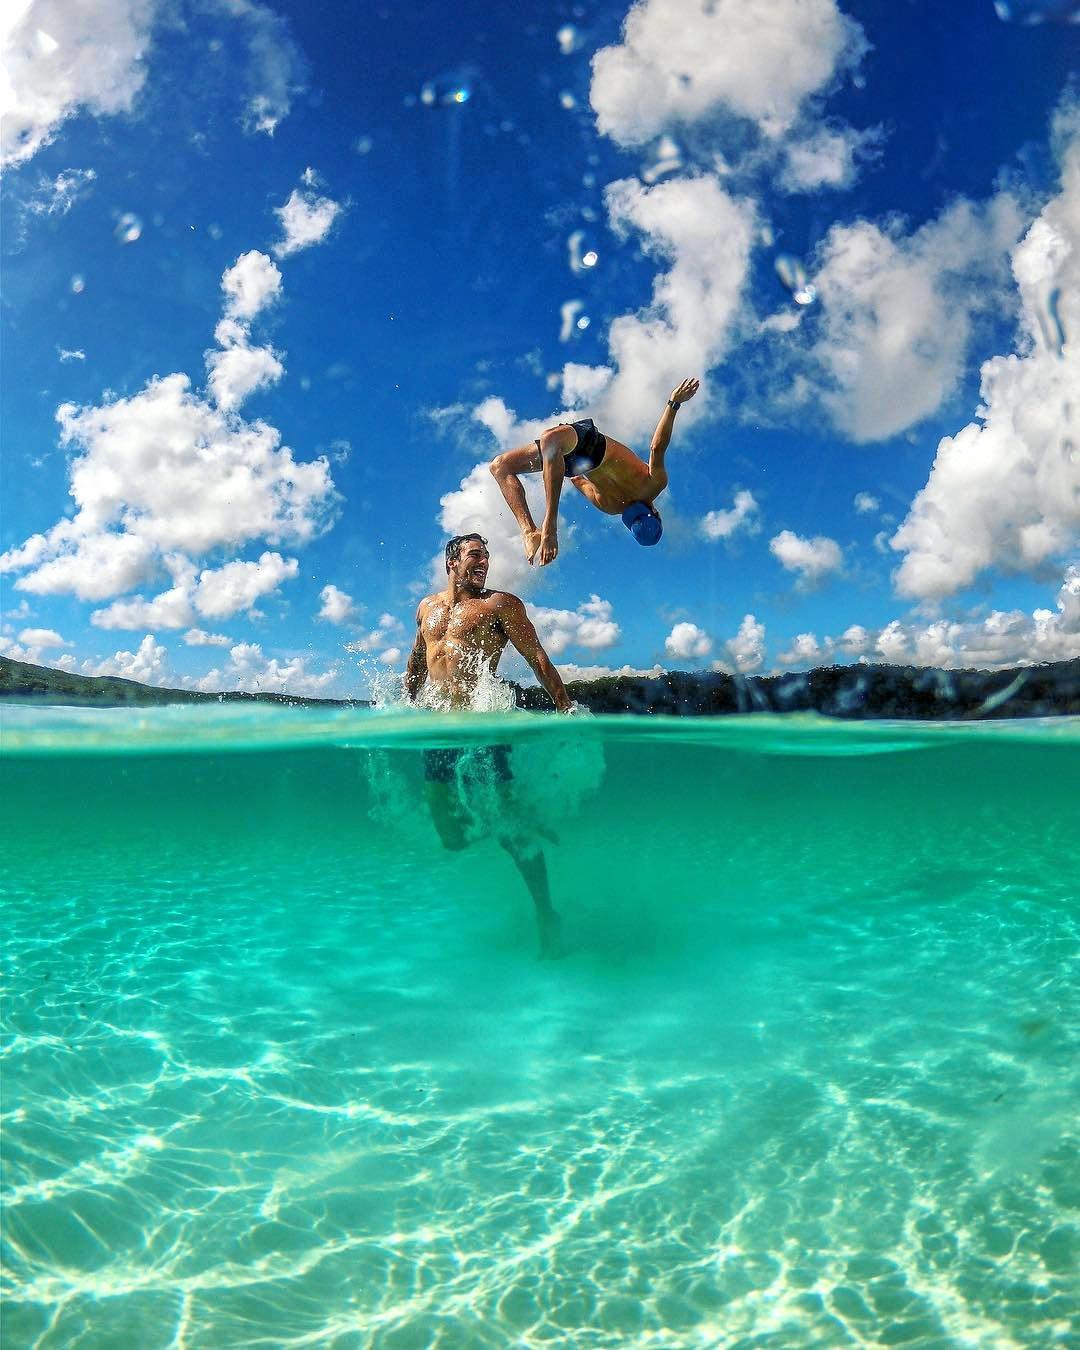 Jockey brand ambassadors during their getaway trip to Fraser Island.